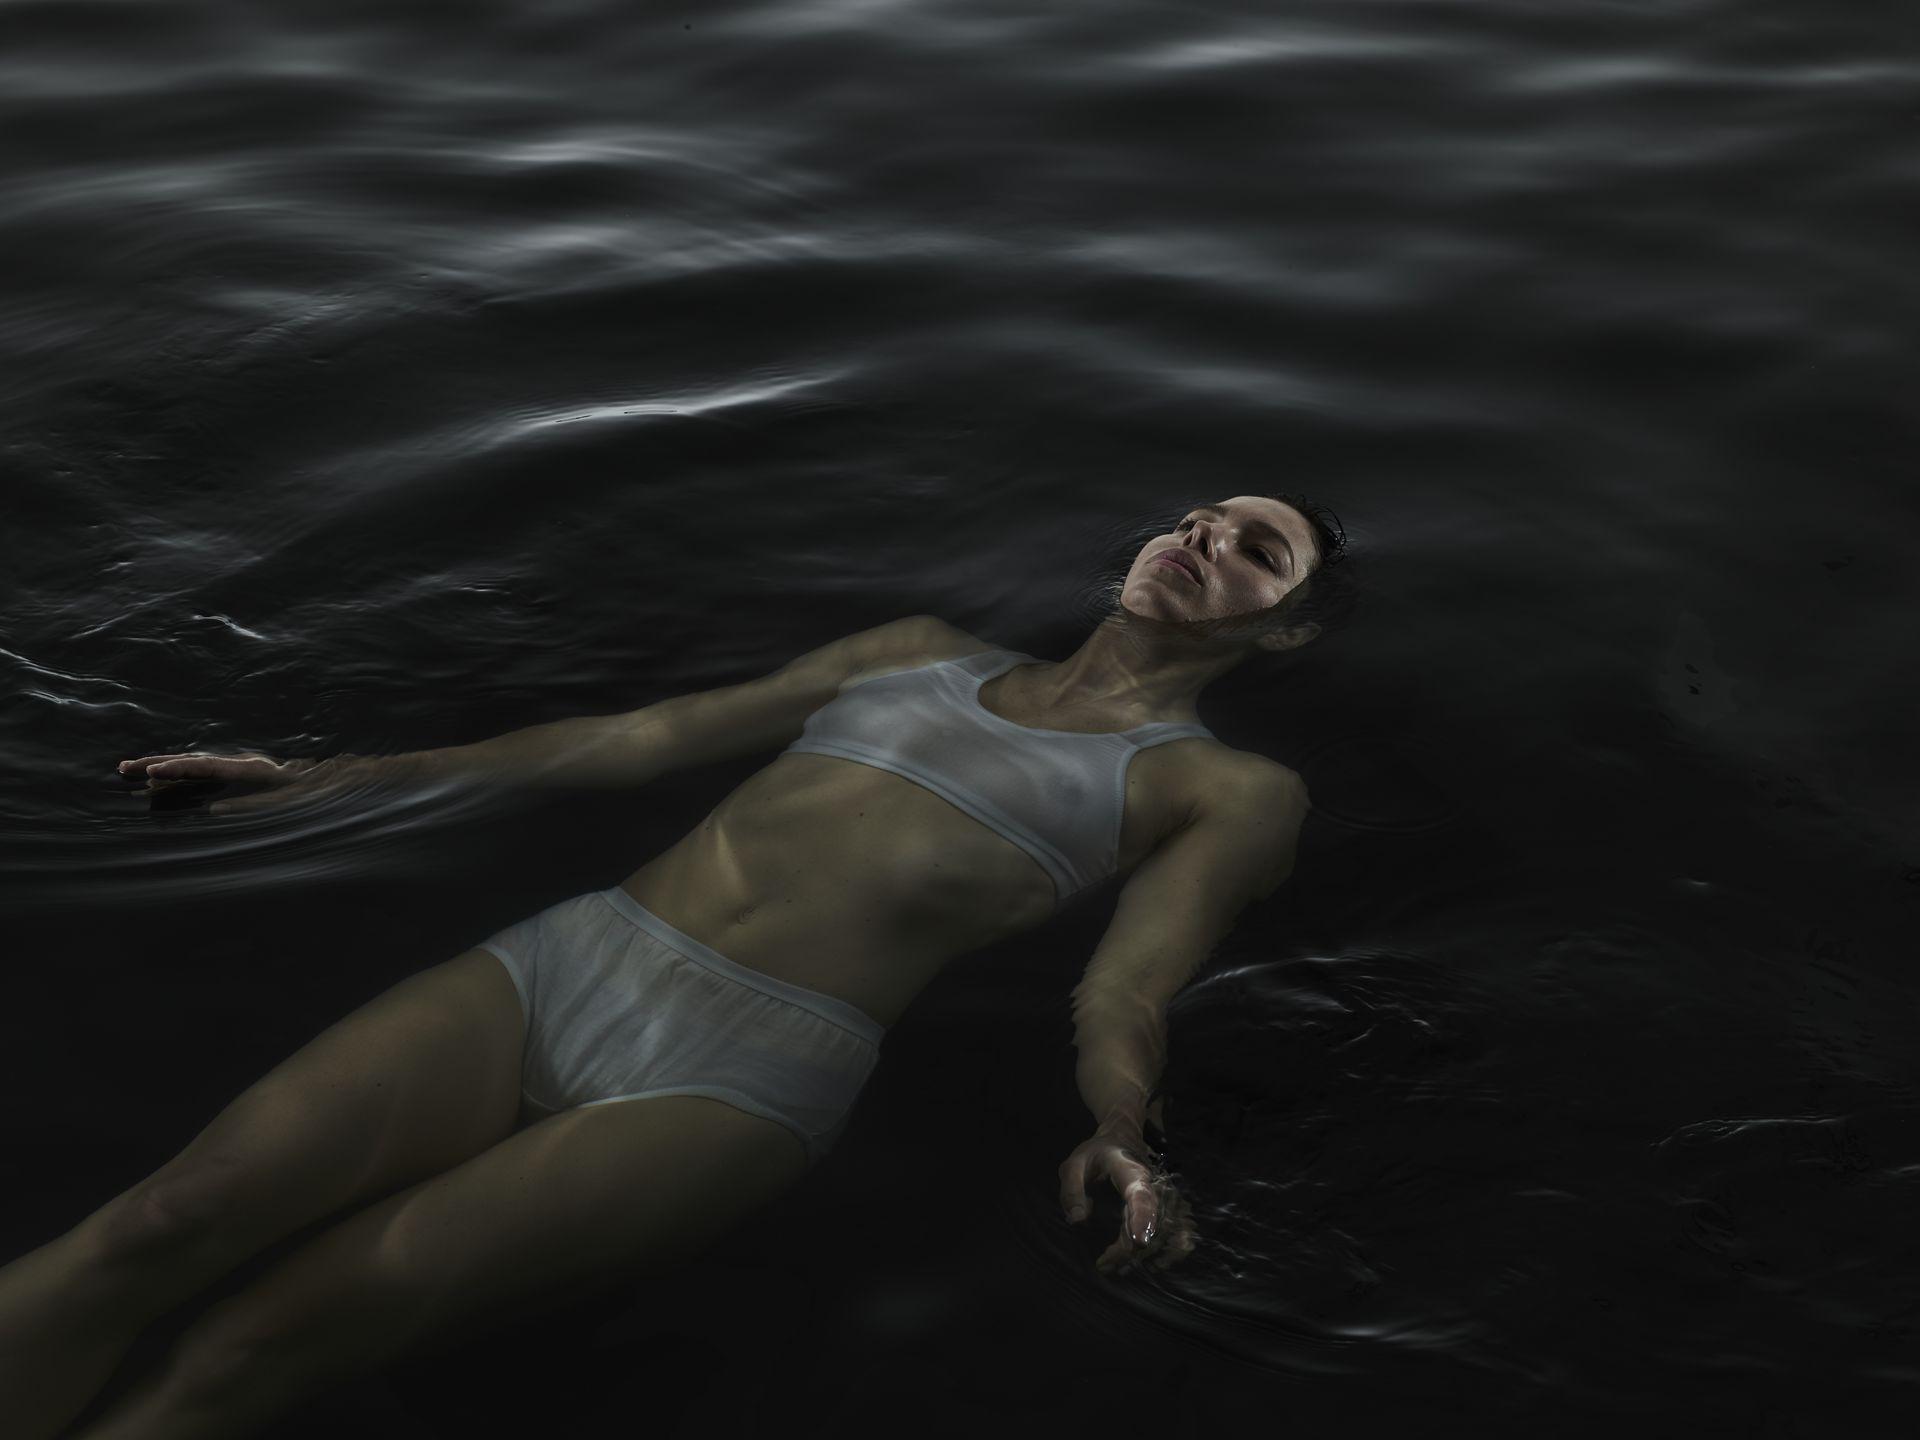 Jessica Biel Sexy Boobs In Wet Top